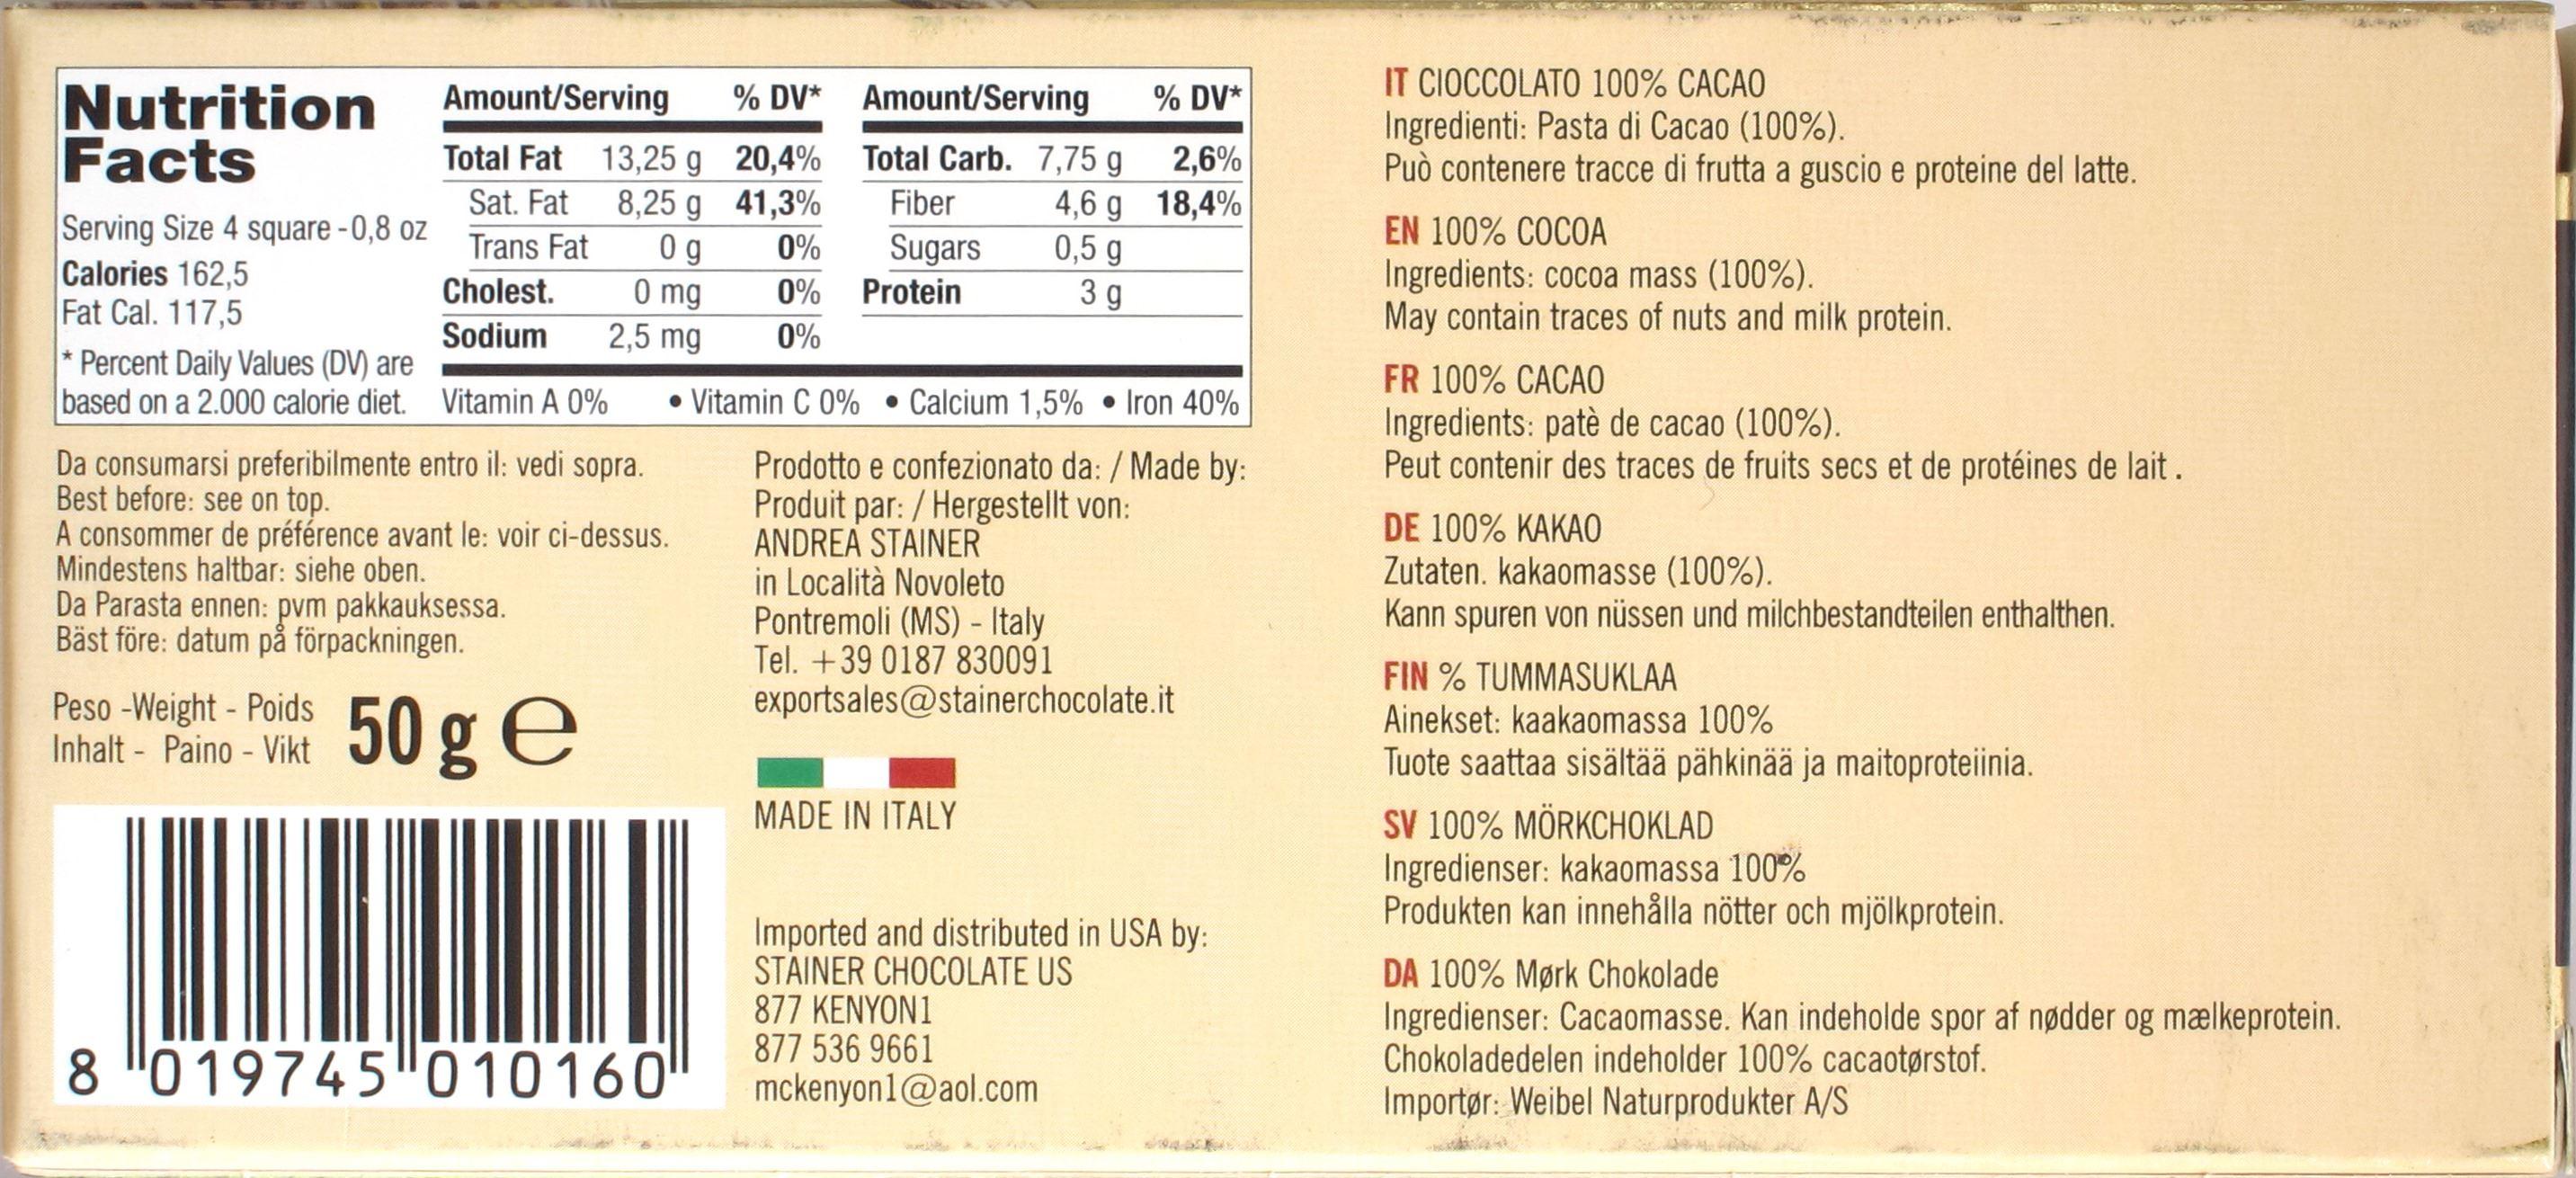 Rückseite Stainer 100% Schokolade bzw. Kakaomasse